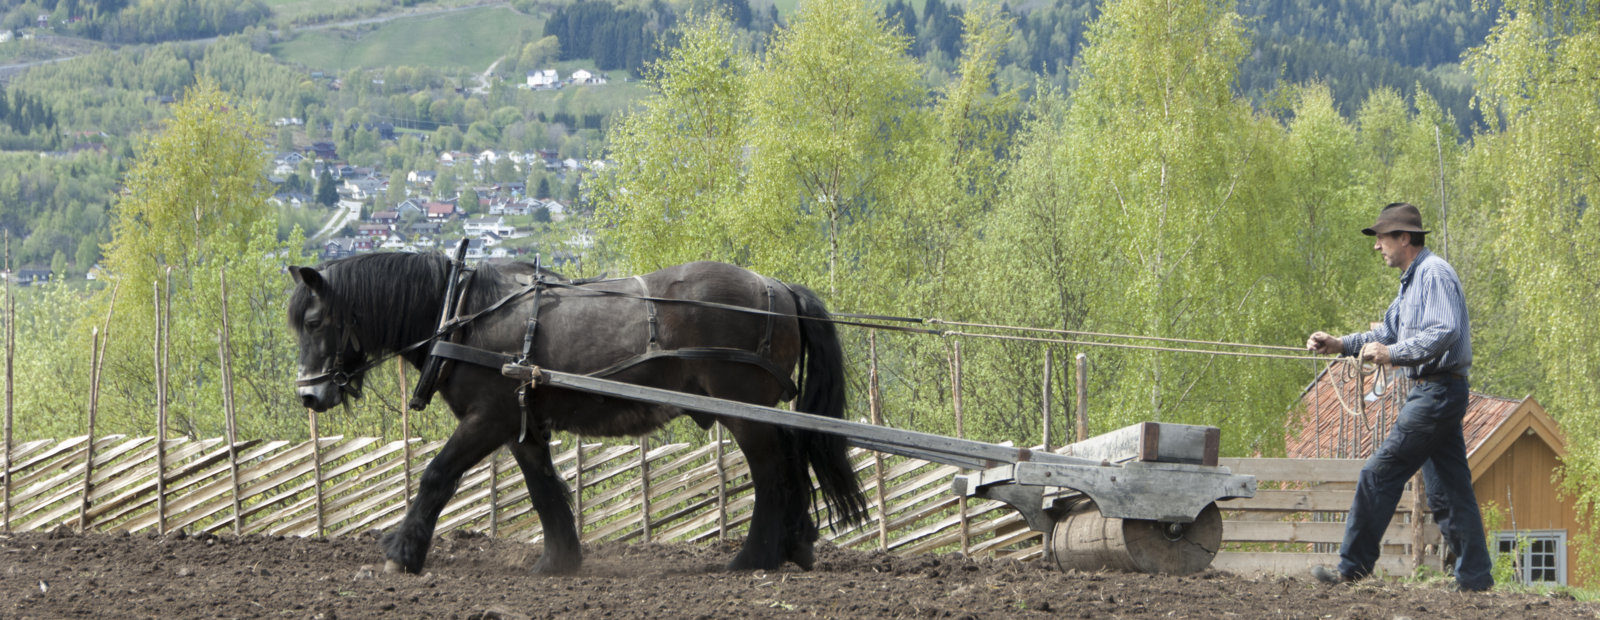 Bonden pølyer på gamle måten med hest på Maihaugen, Lillehammer